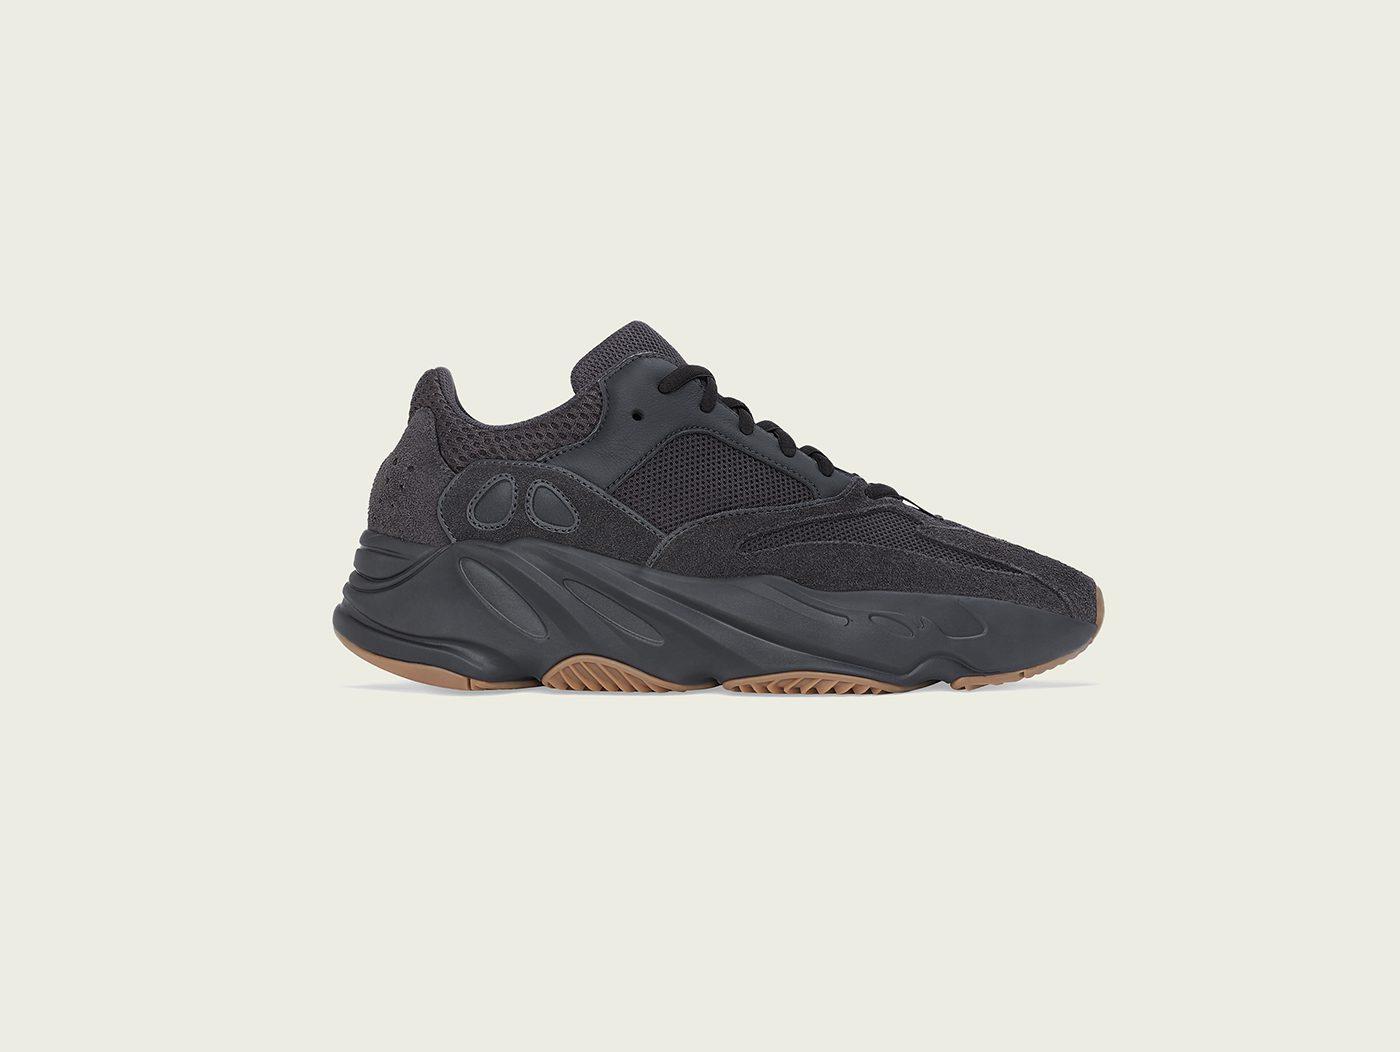 adidas Originals YEEZY BOOST 700 UTILITY BLACK